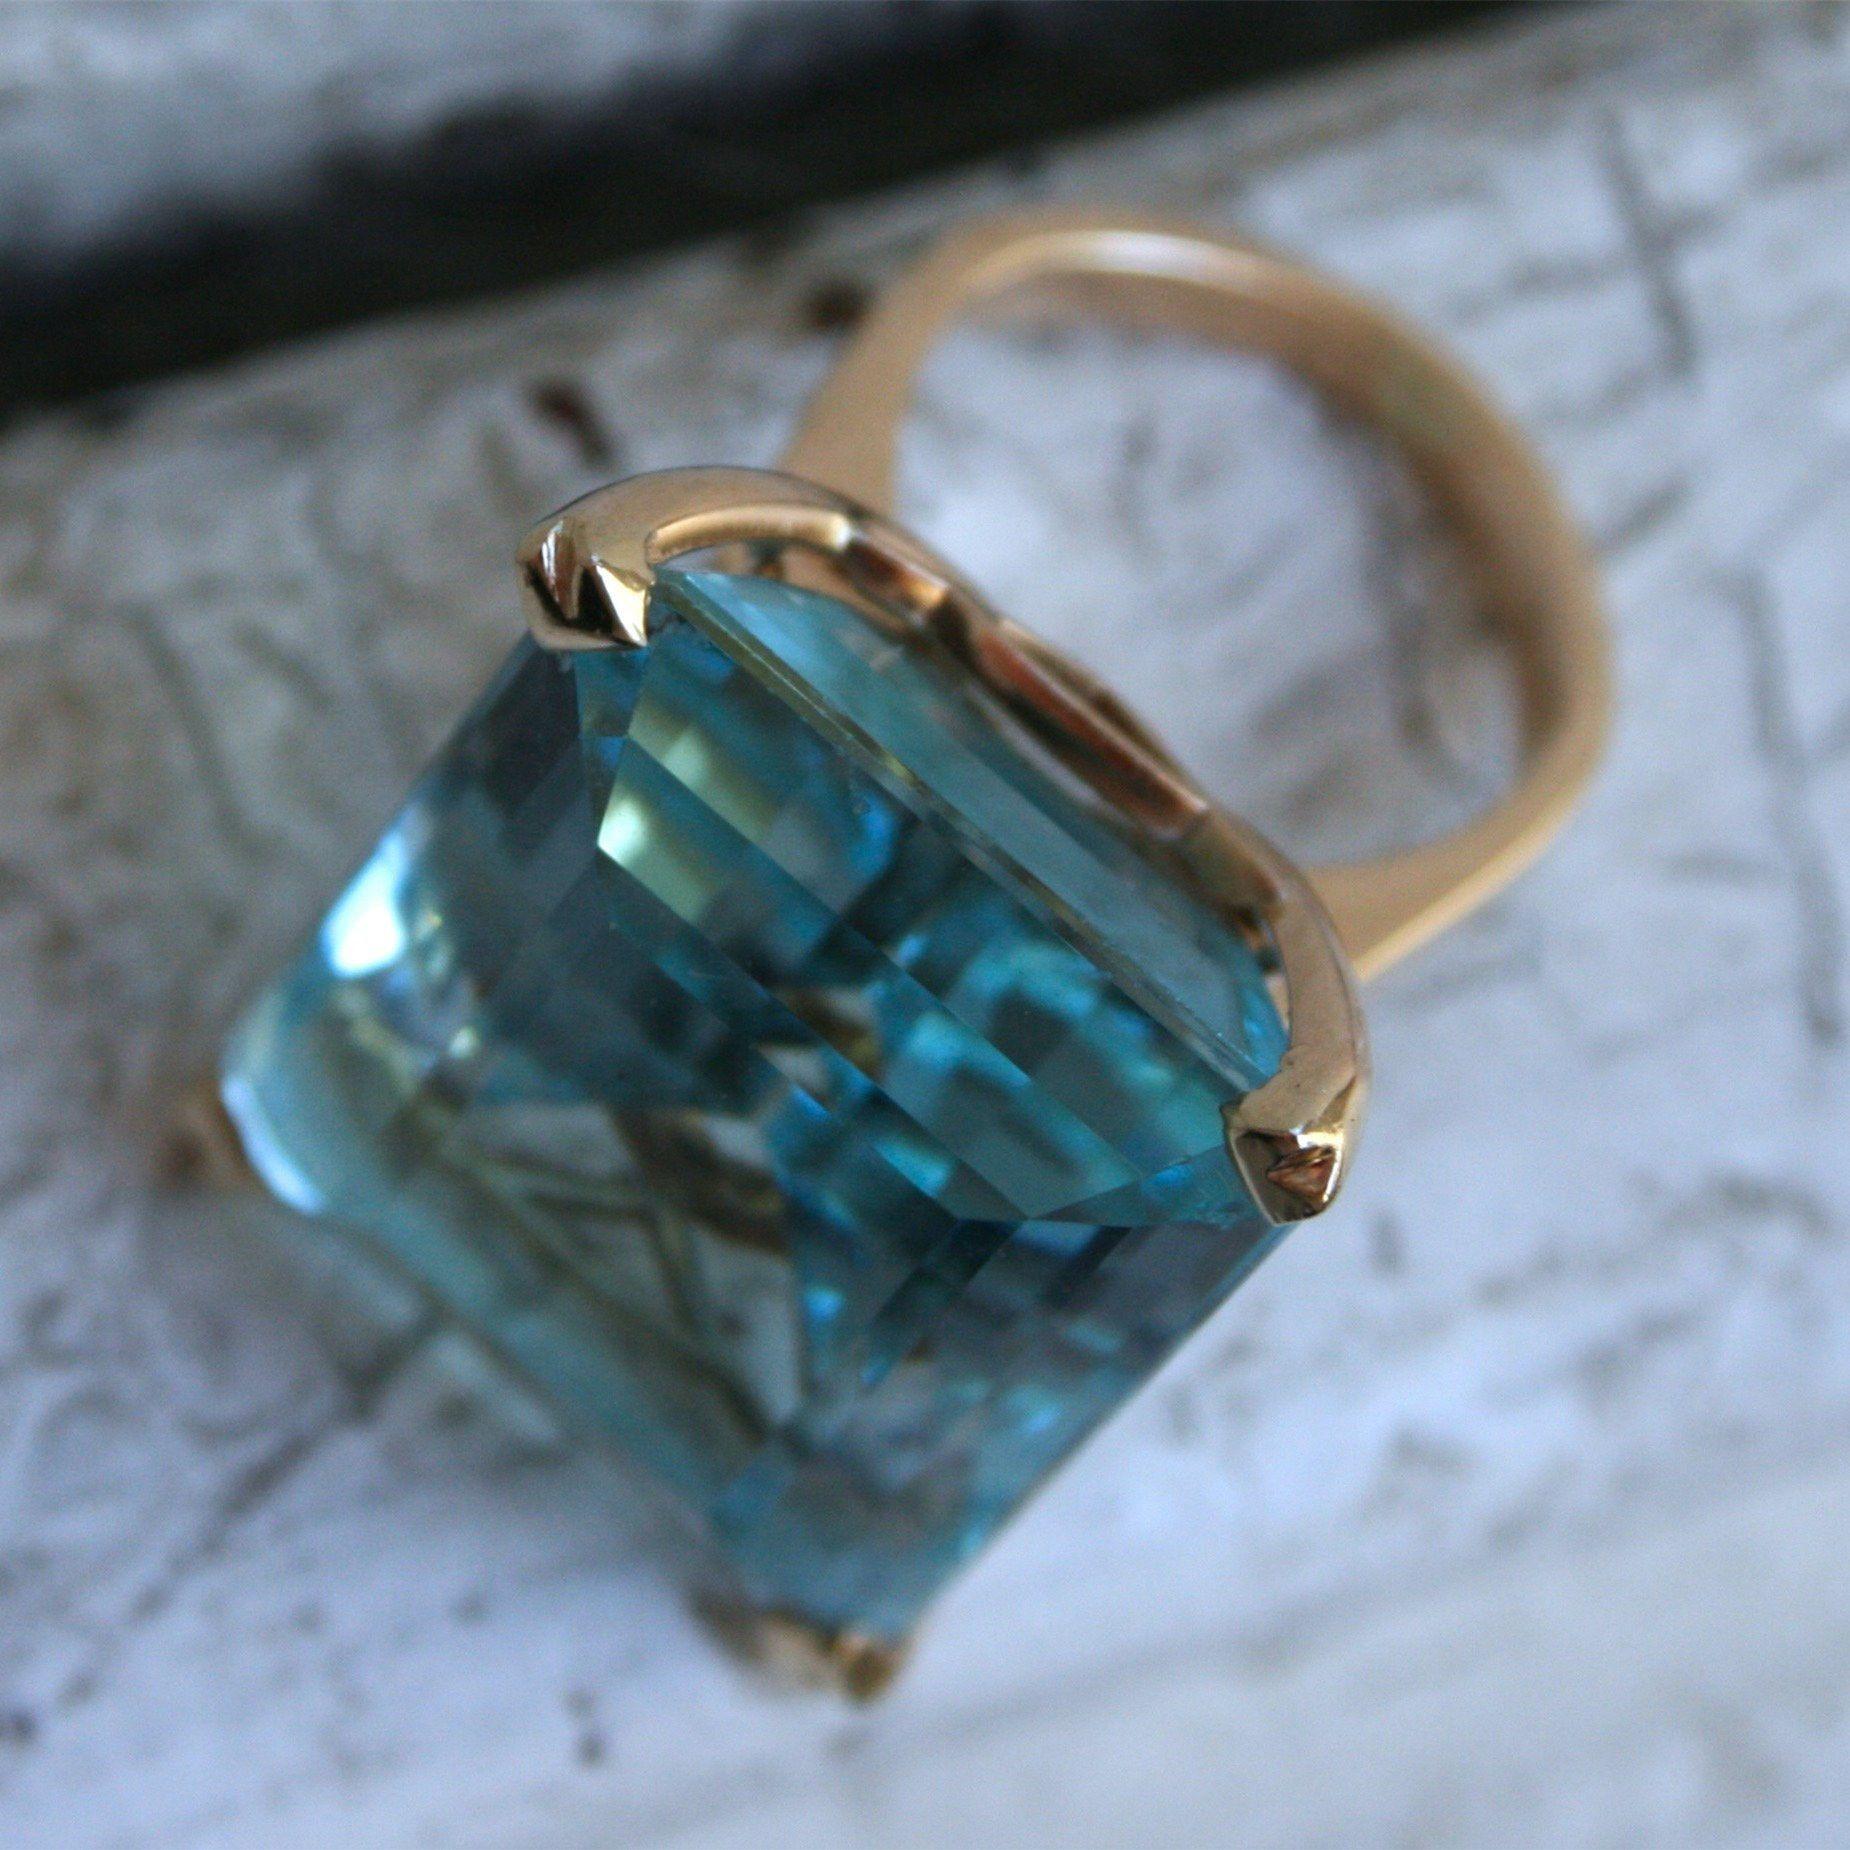 Mar azul topázio pedra princesa anel de diamante de noivado de safira anel de ouro 14K Anillos para as mulheres biżuteria jade jóias com diamantes 201116